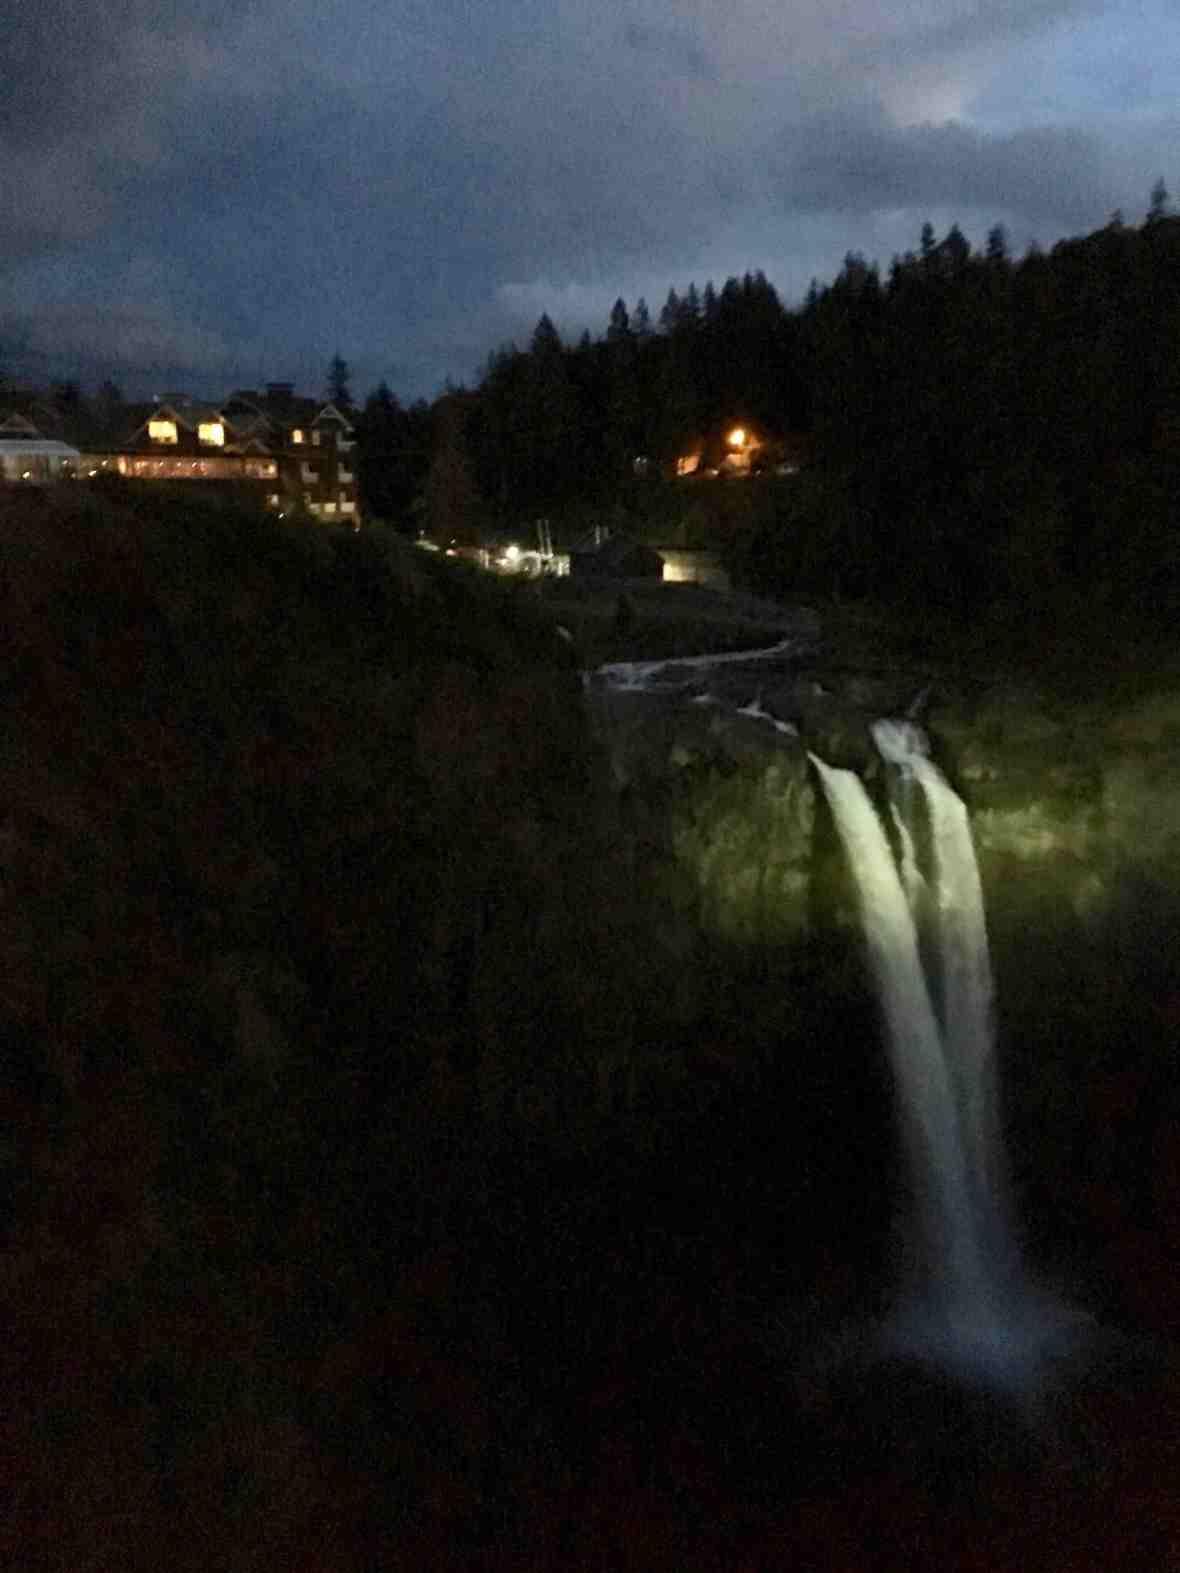 Twin Peaks filming location - Salish Lodge and Snoqualmie Falls,Washington